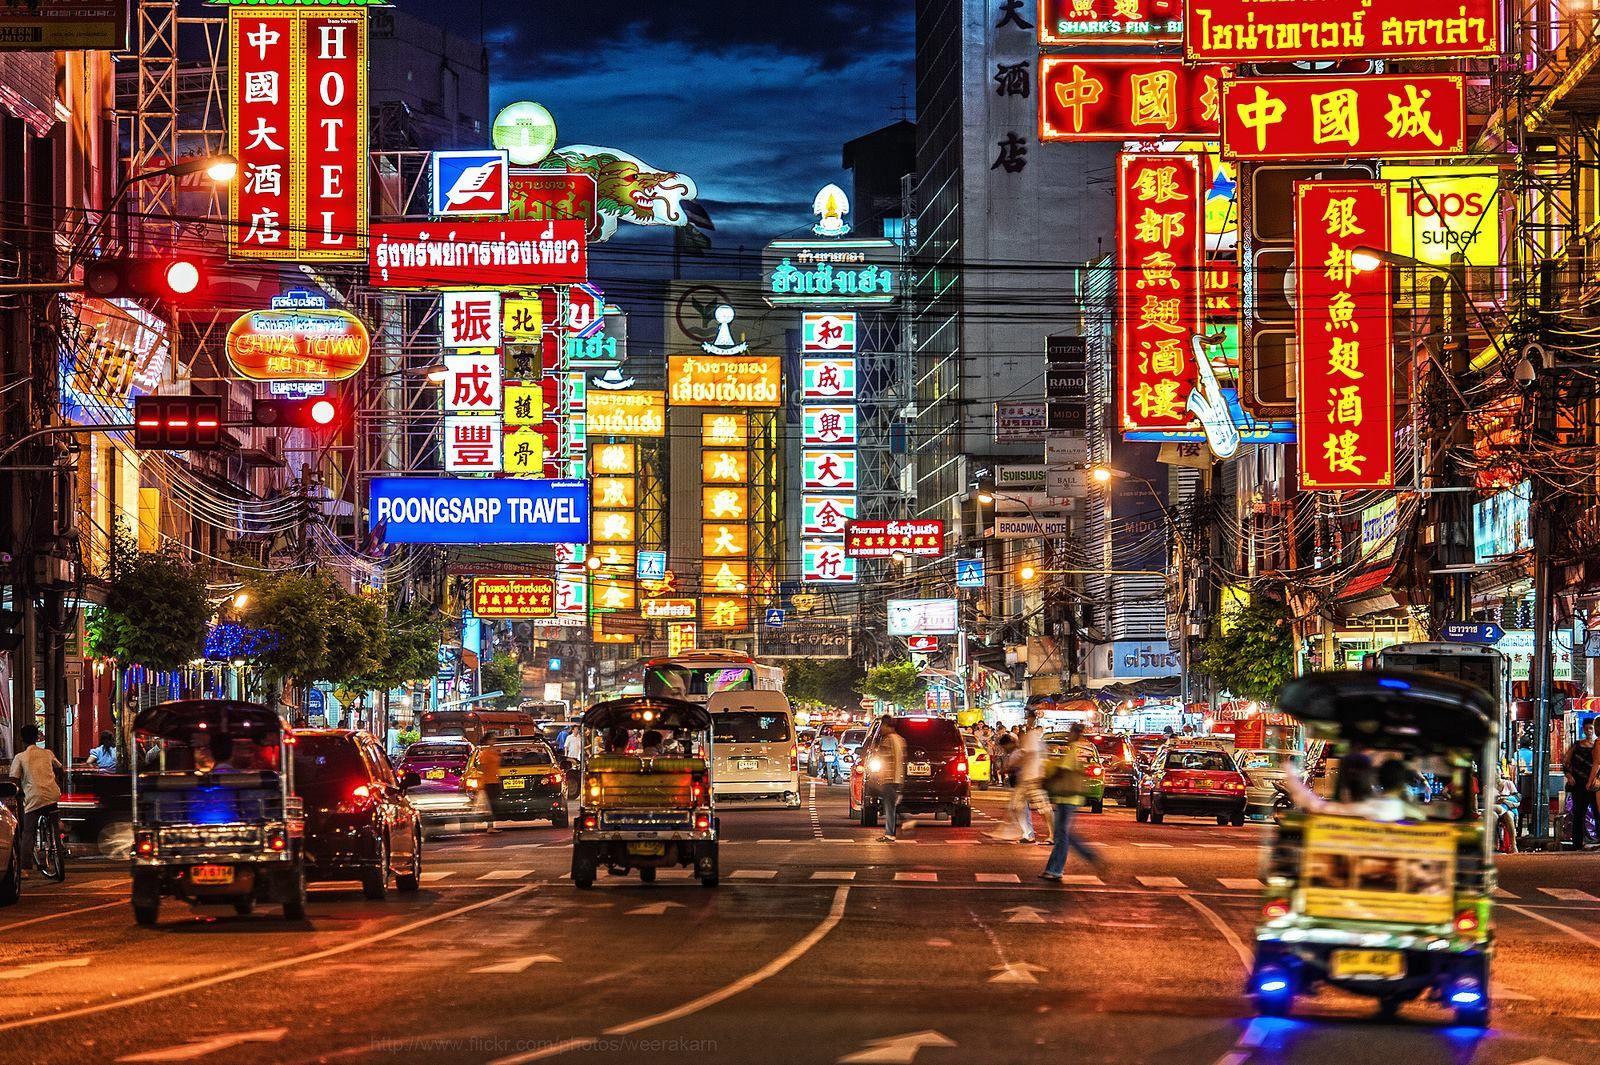 Neon Lights And Traffic On Yaowarat Road At Night In Chinatown Bangkok Bangkok Travel Bangkok Tourist Thailand Travel